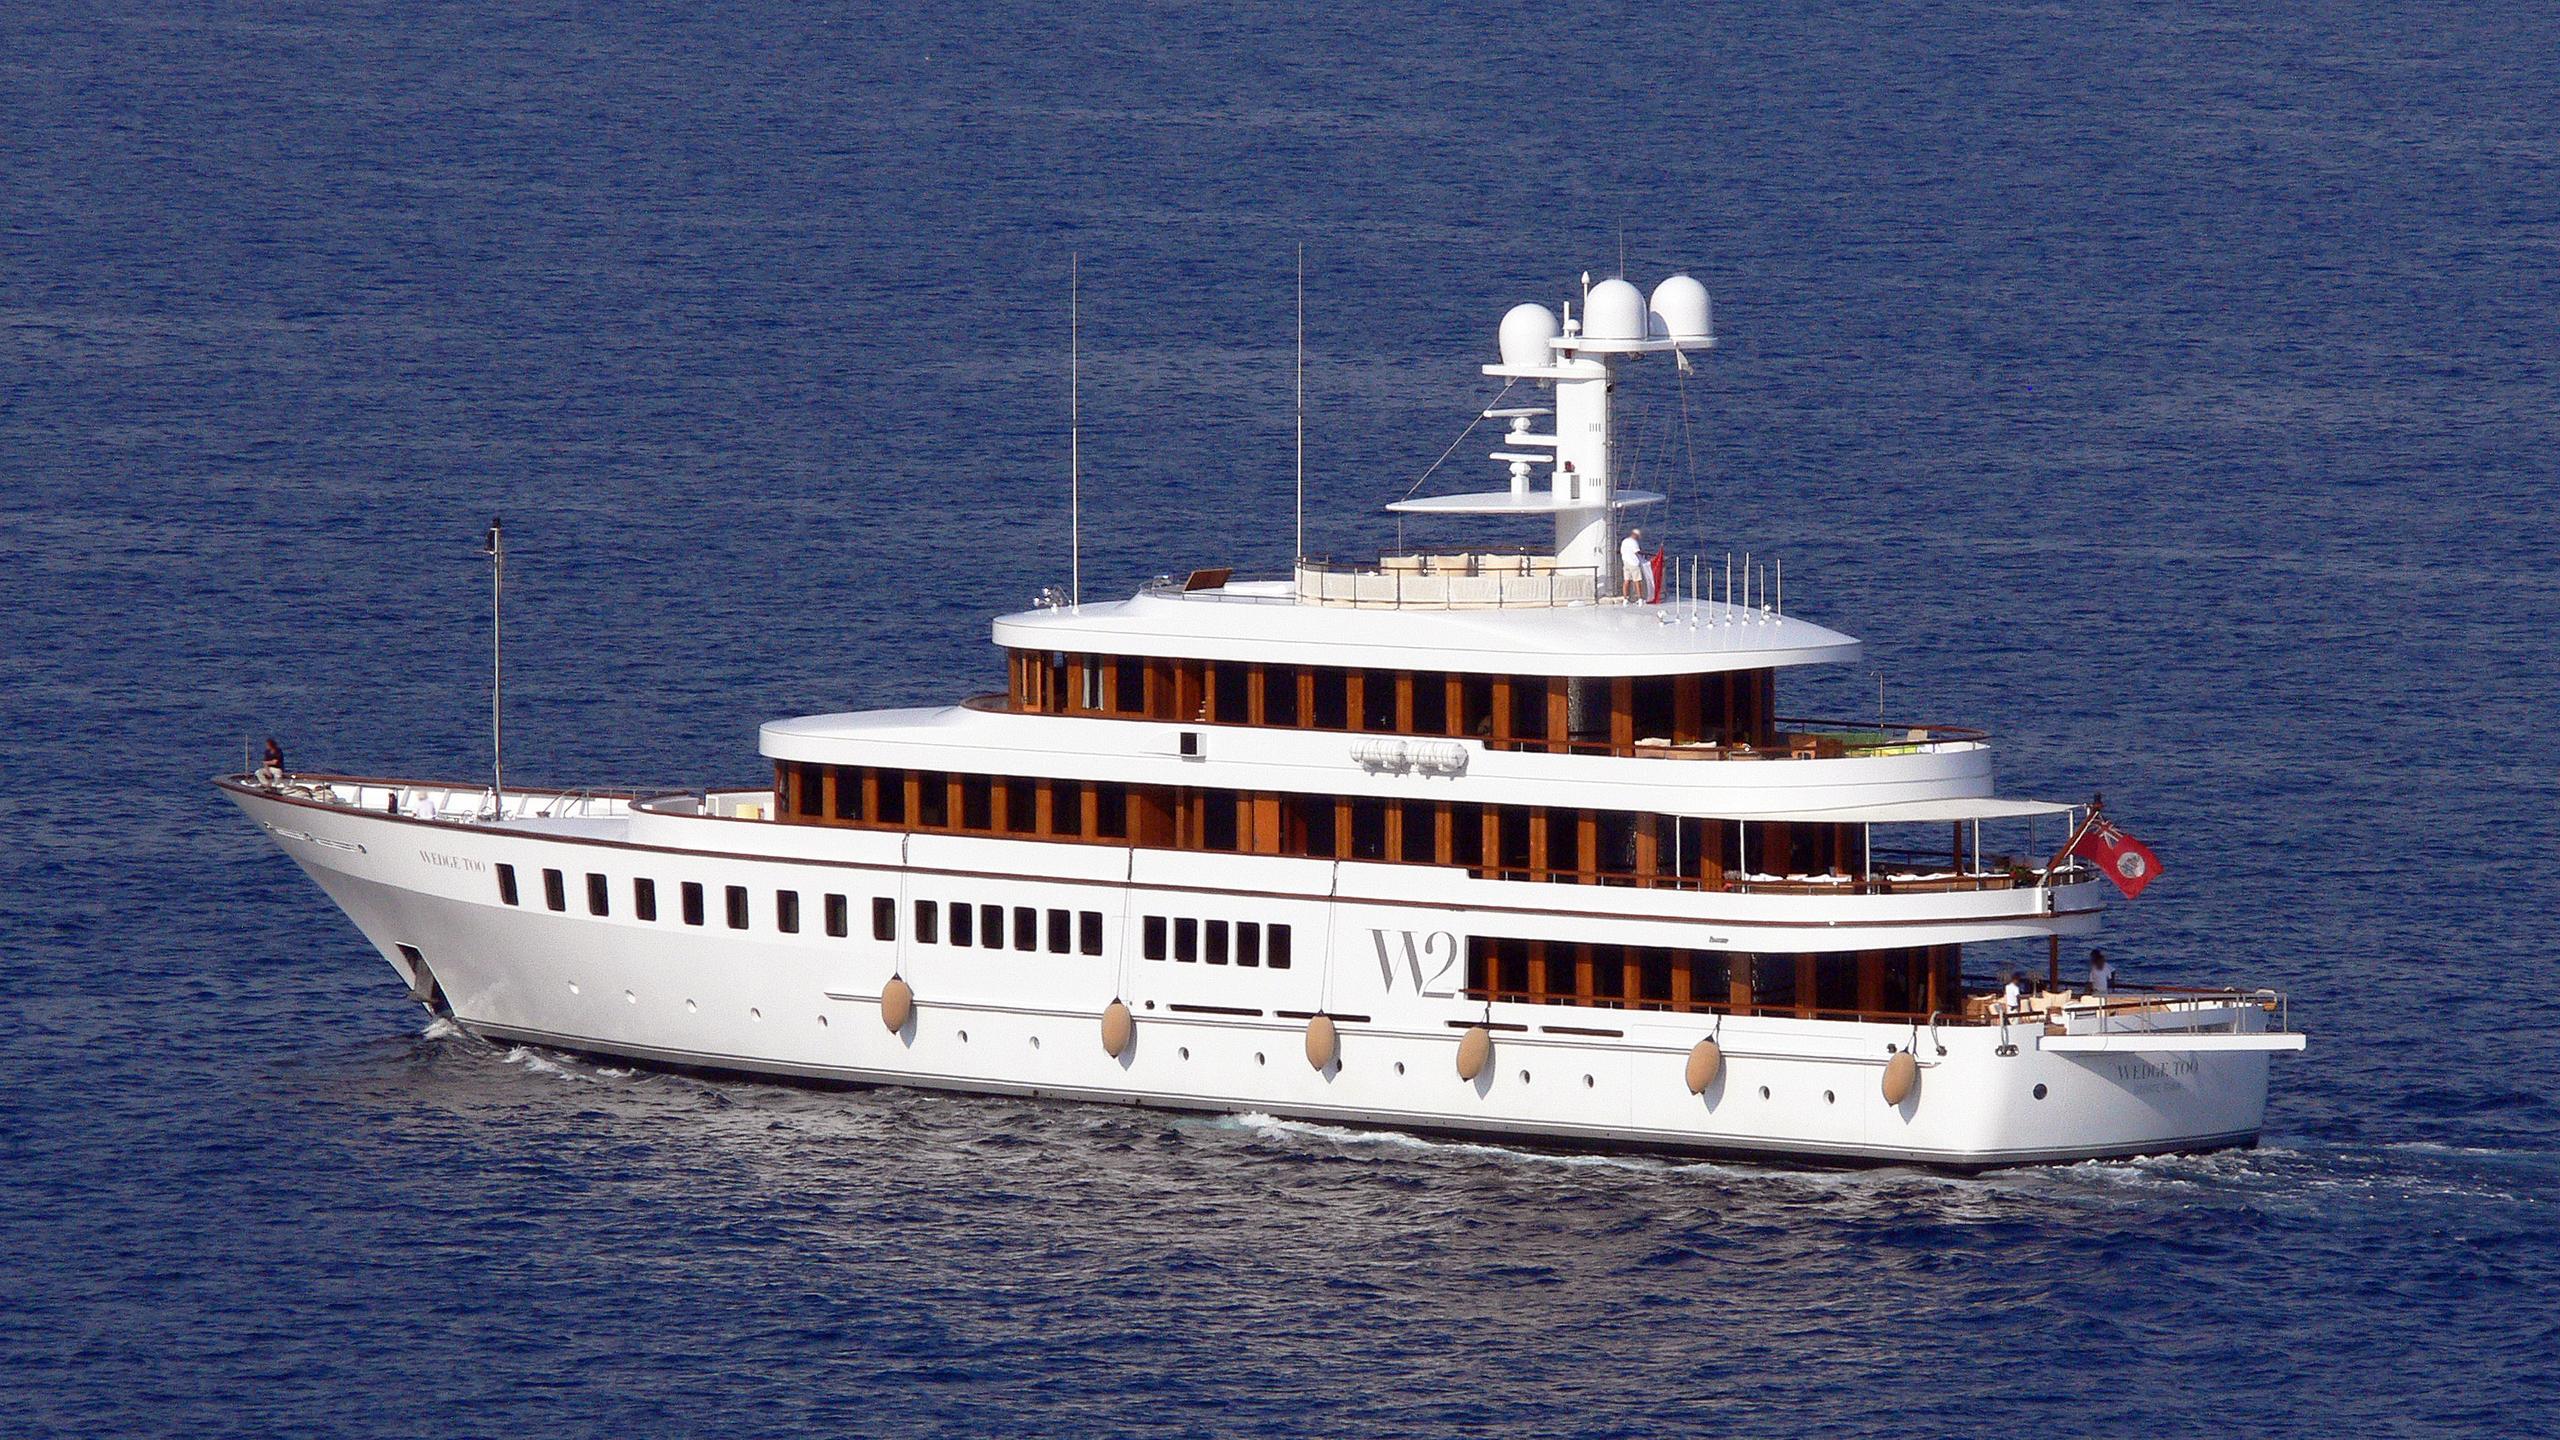 wedge-too-rmotor-yacht-feadship-2002-65m-half-profile-bow